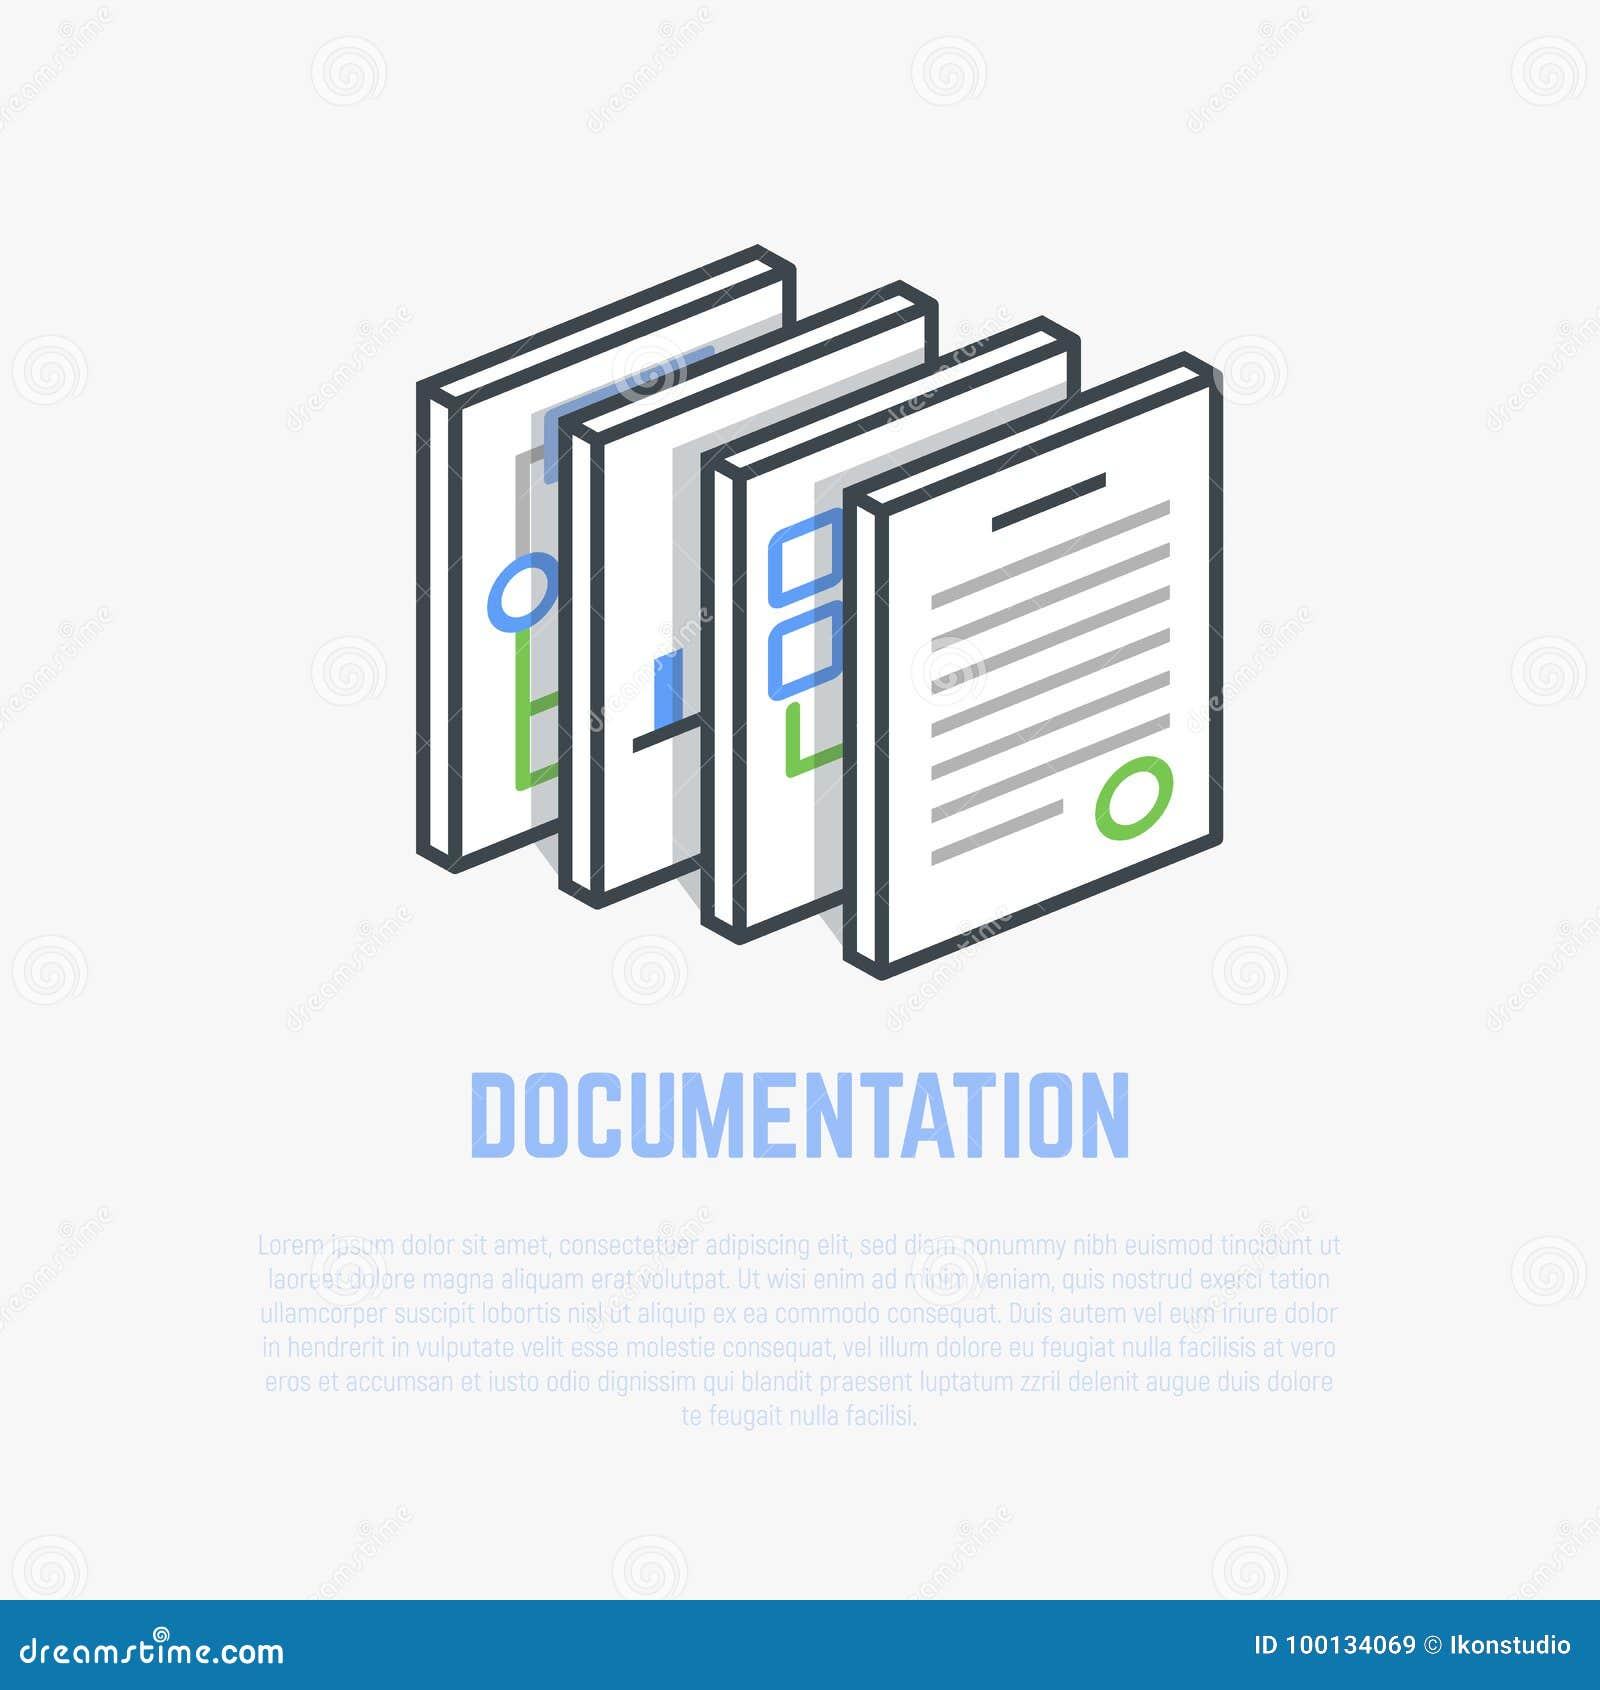 Isometric απεικόνιση τεκμηρίωσης